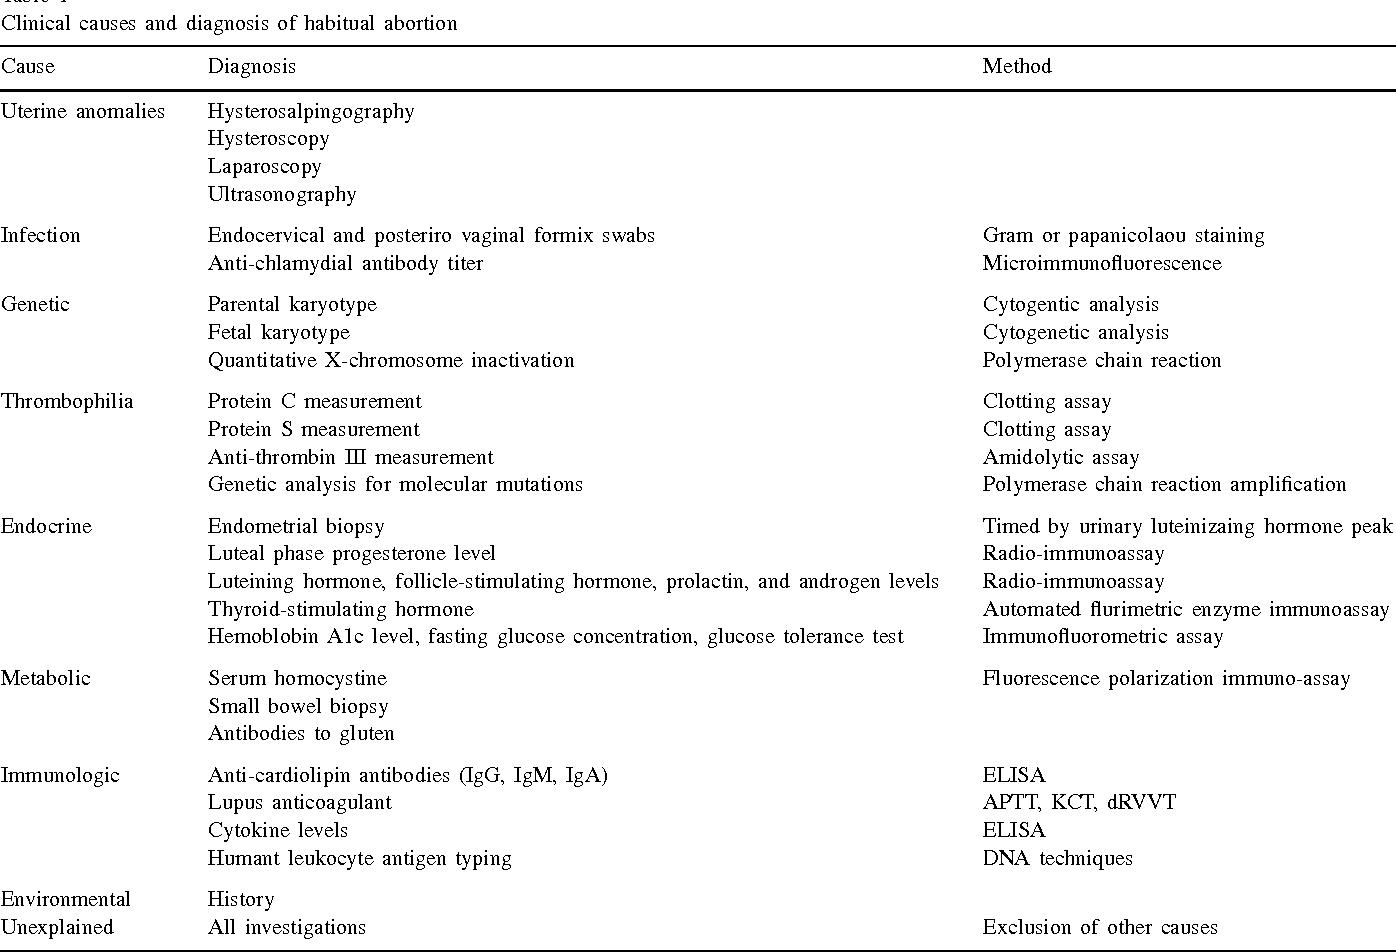 Habitual abortion: causes, diagnosis, and treatment - Semantic Scholar